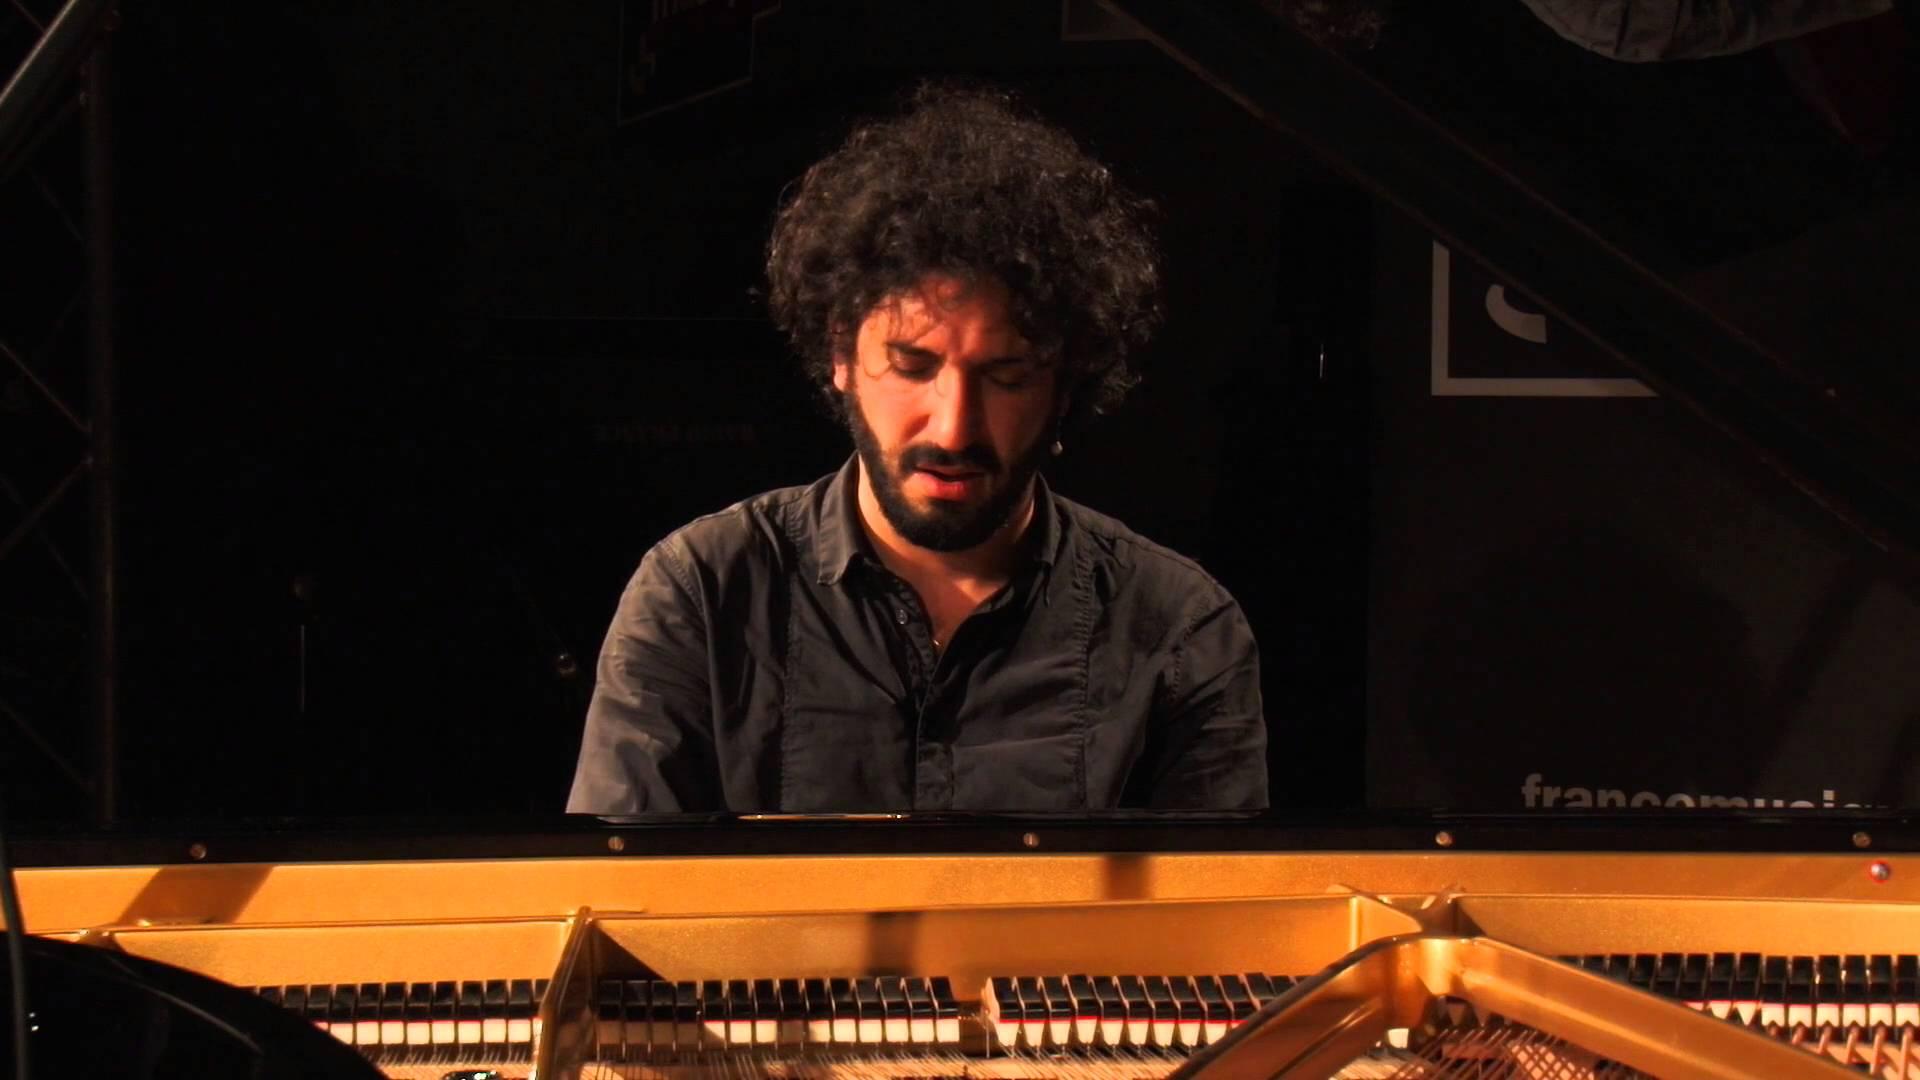 Concert #1 Nima Sarkechik